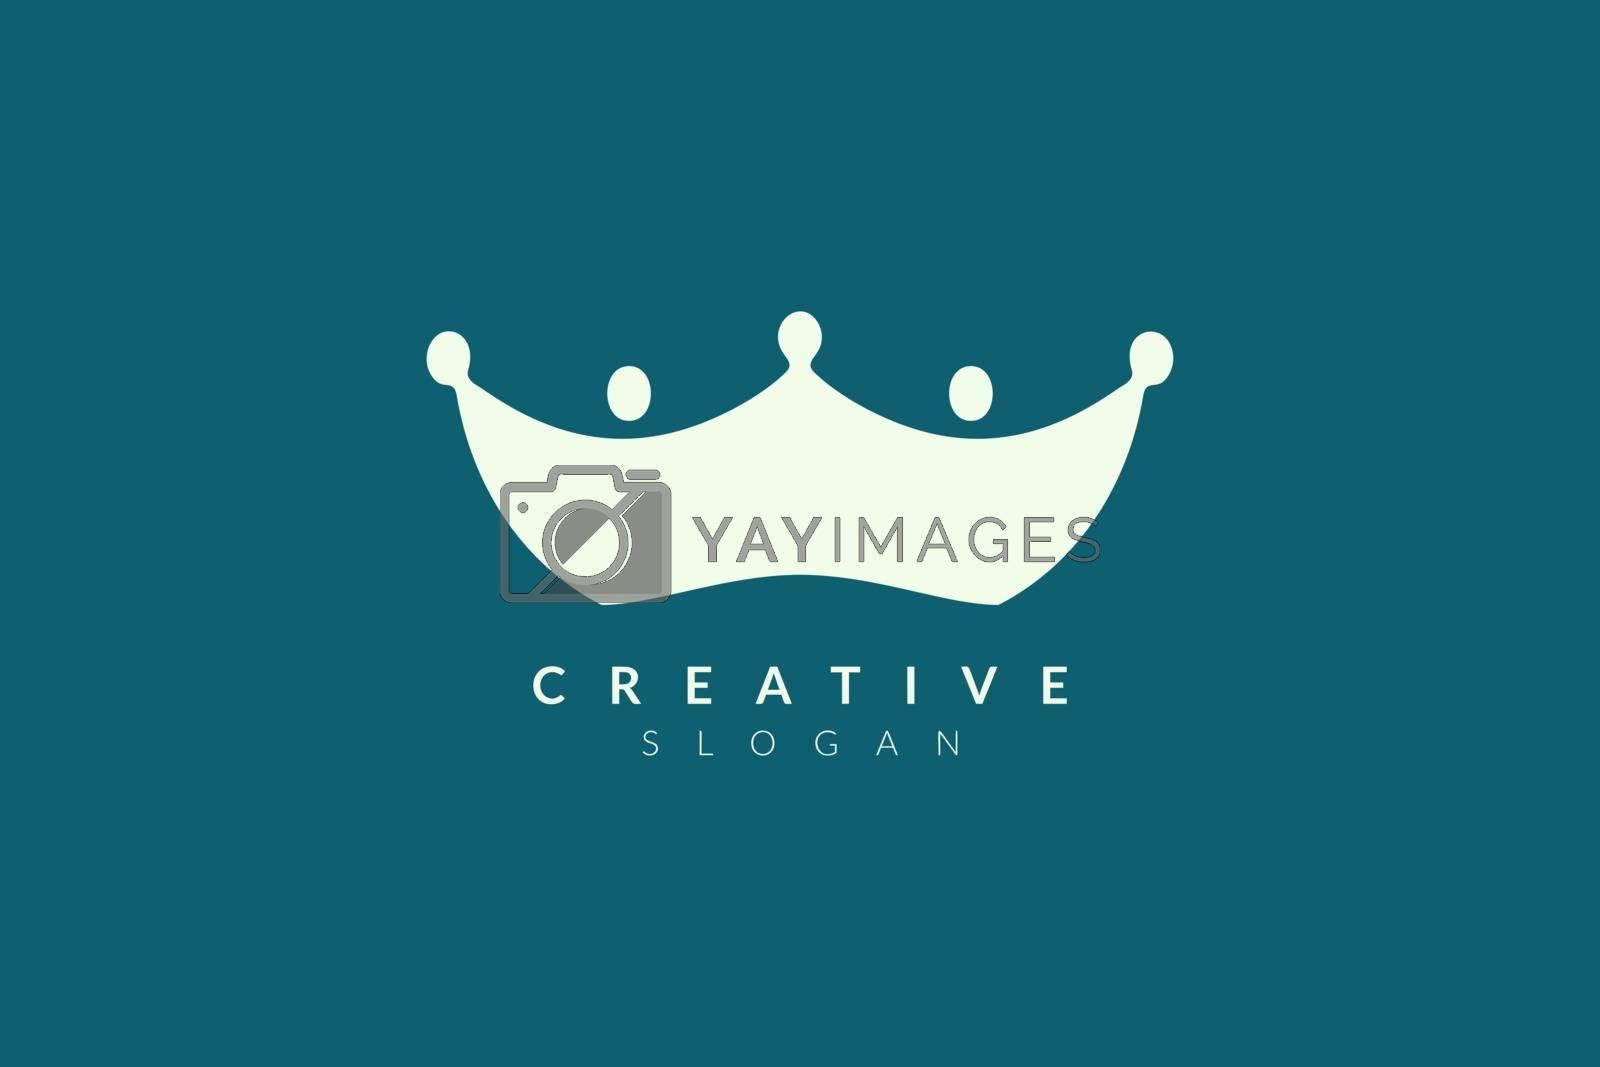 Crown logo design. Minimalist and modern vector illustration design suitable for business or brand.